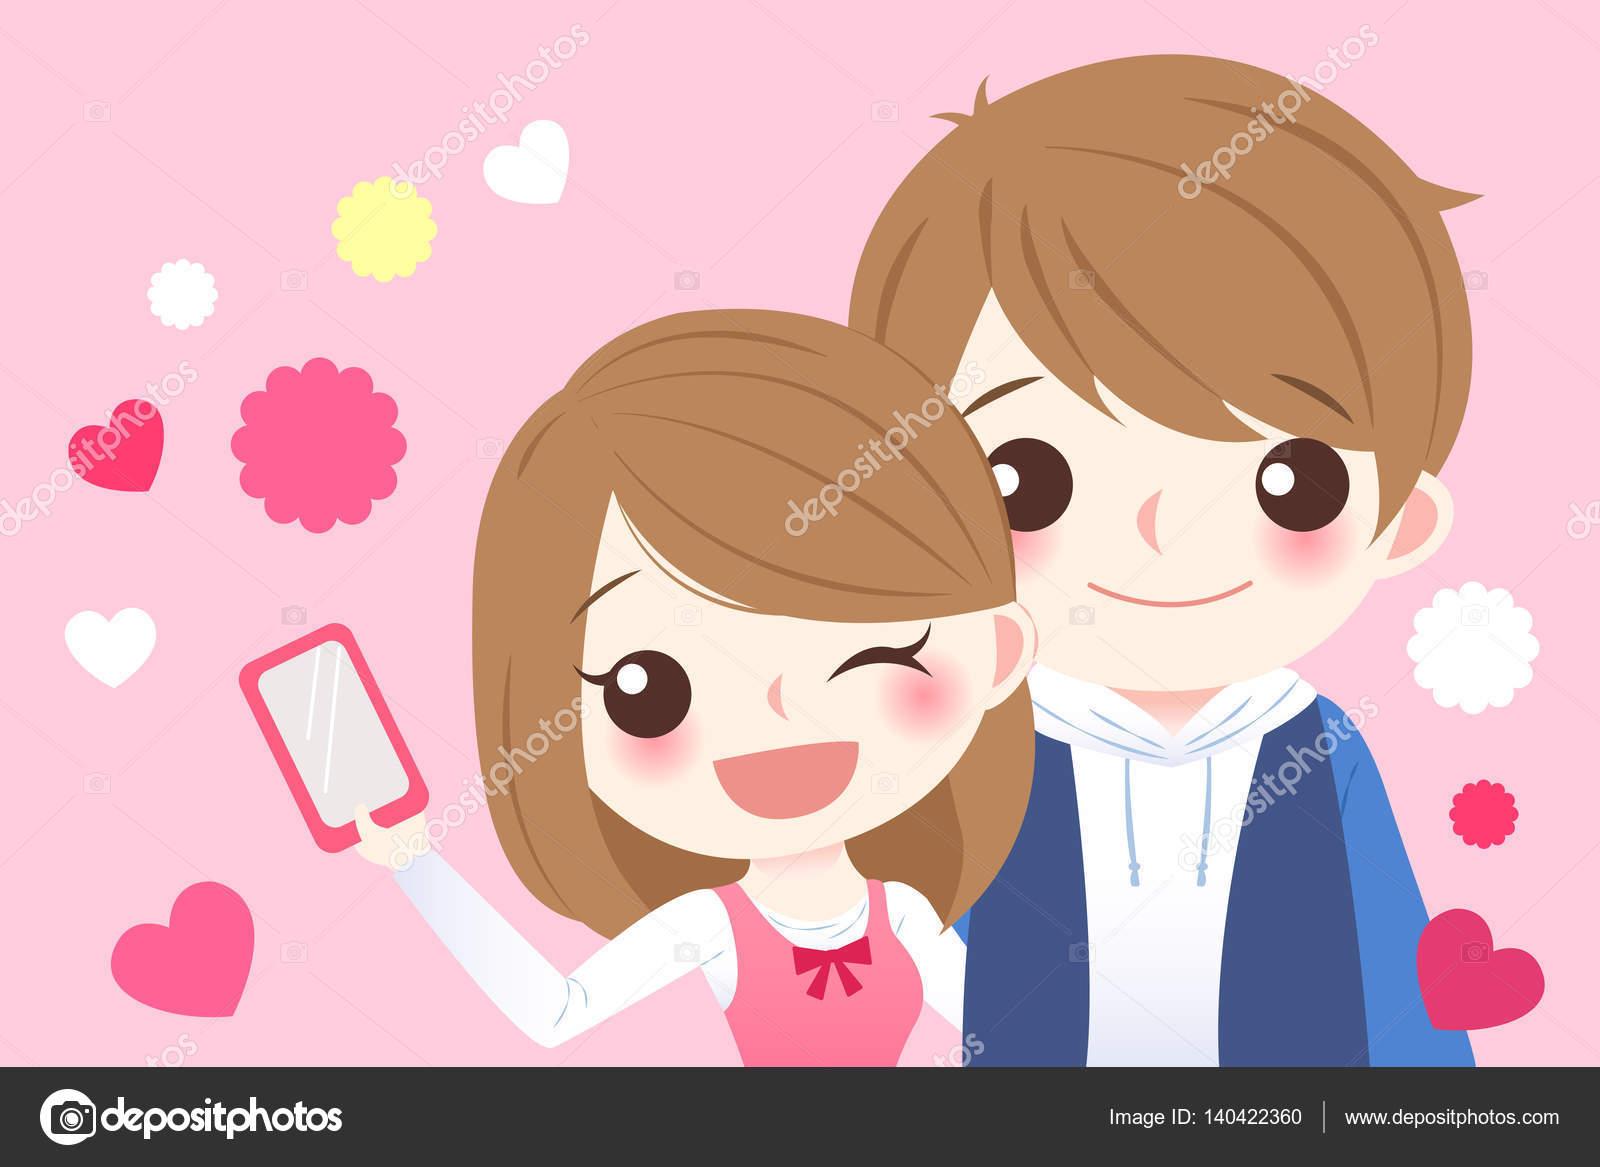 Dessin Anime Mignon Couple Selfie Image Vectorielle Estherqueen999